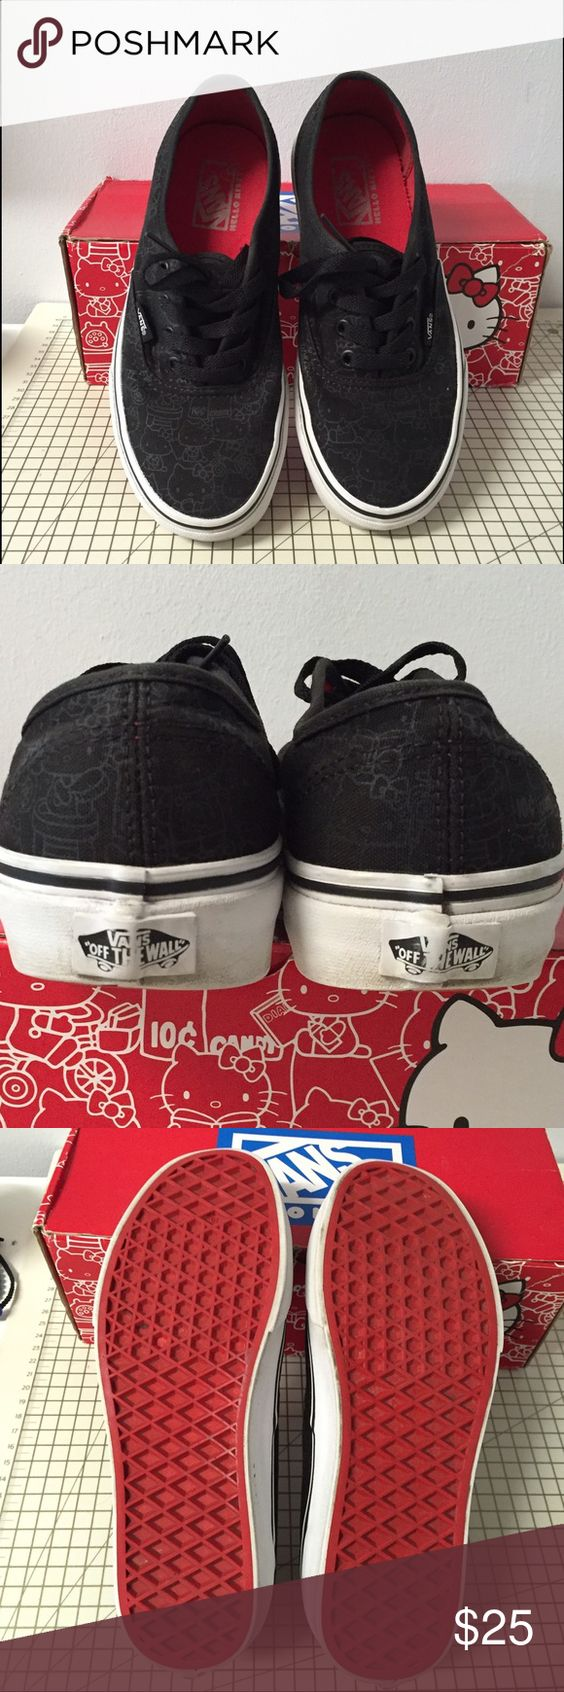 Hello kitty vans In good condition Vans Shoes Sneakers